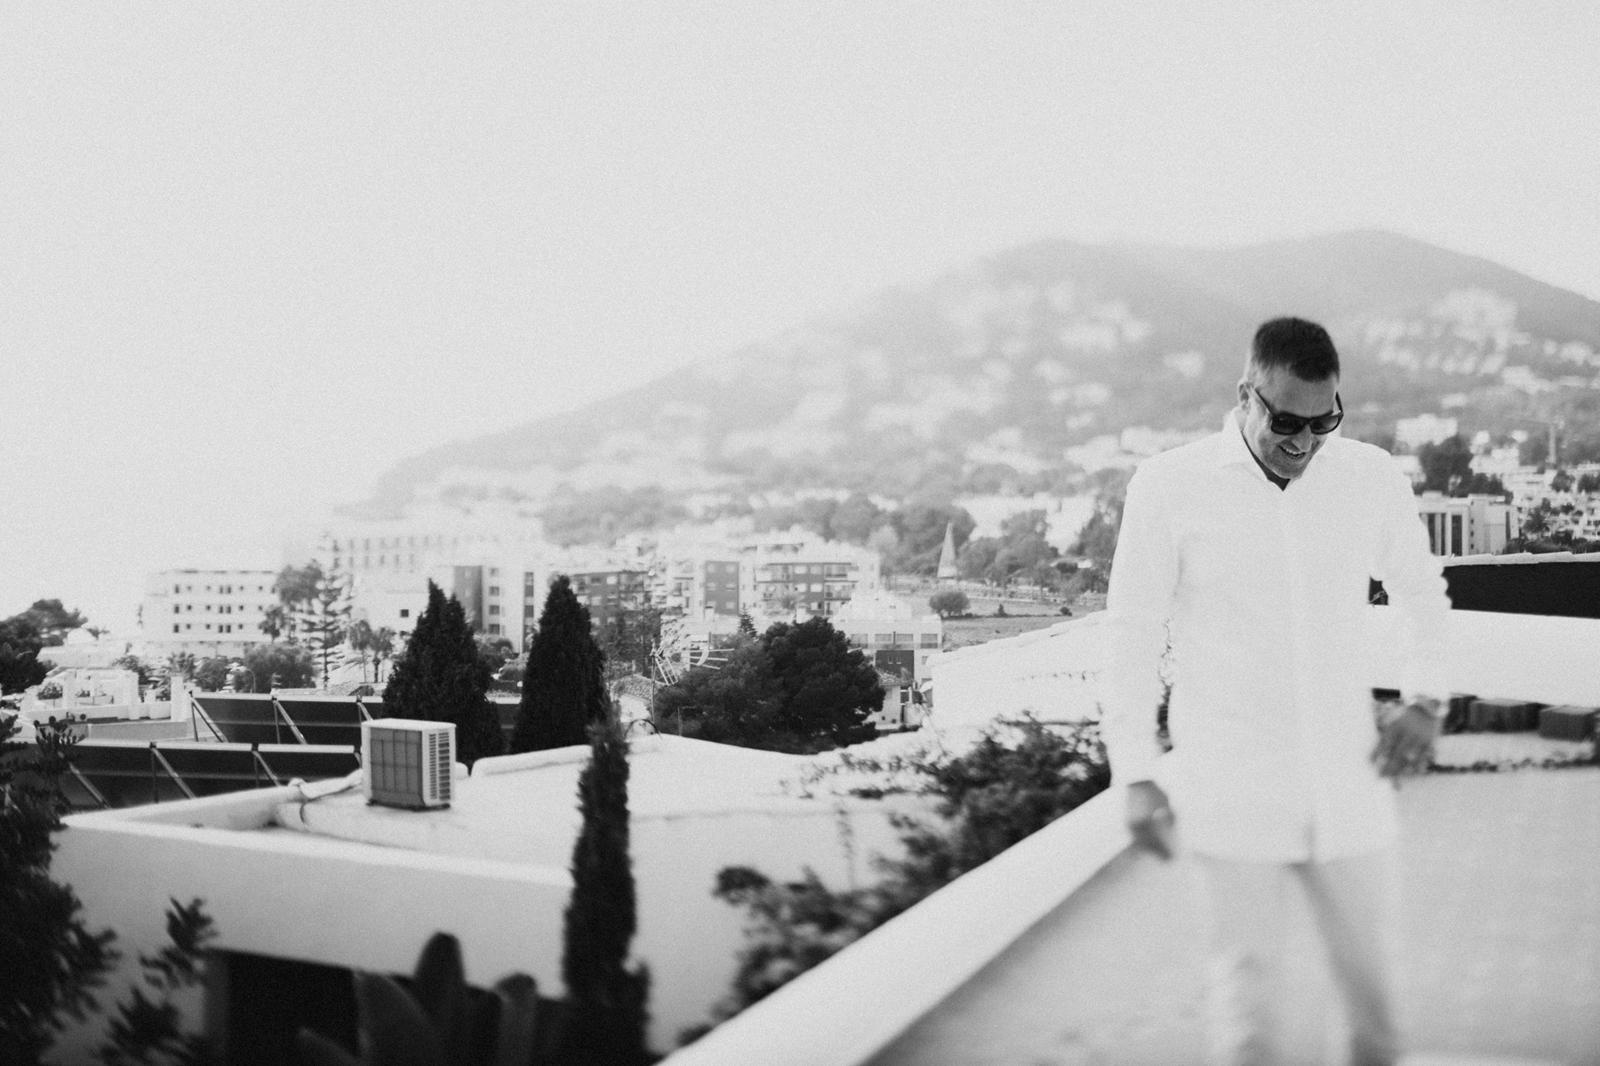 Hochzeitsfotograf_Ibiza_045.jpg